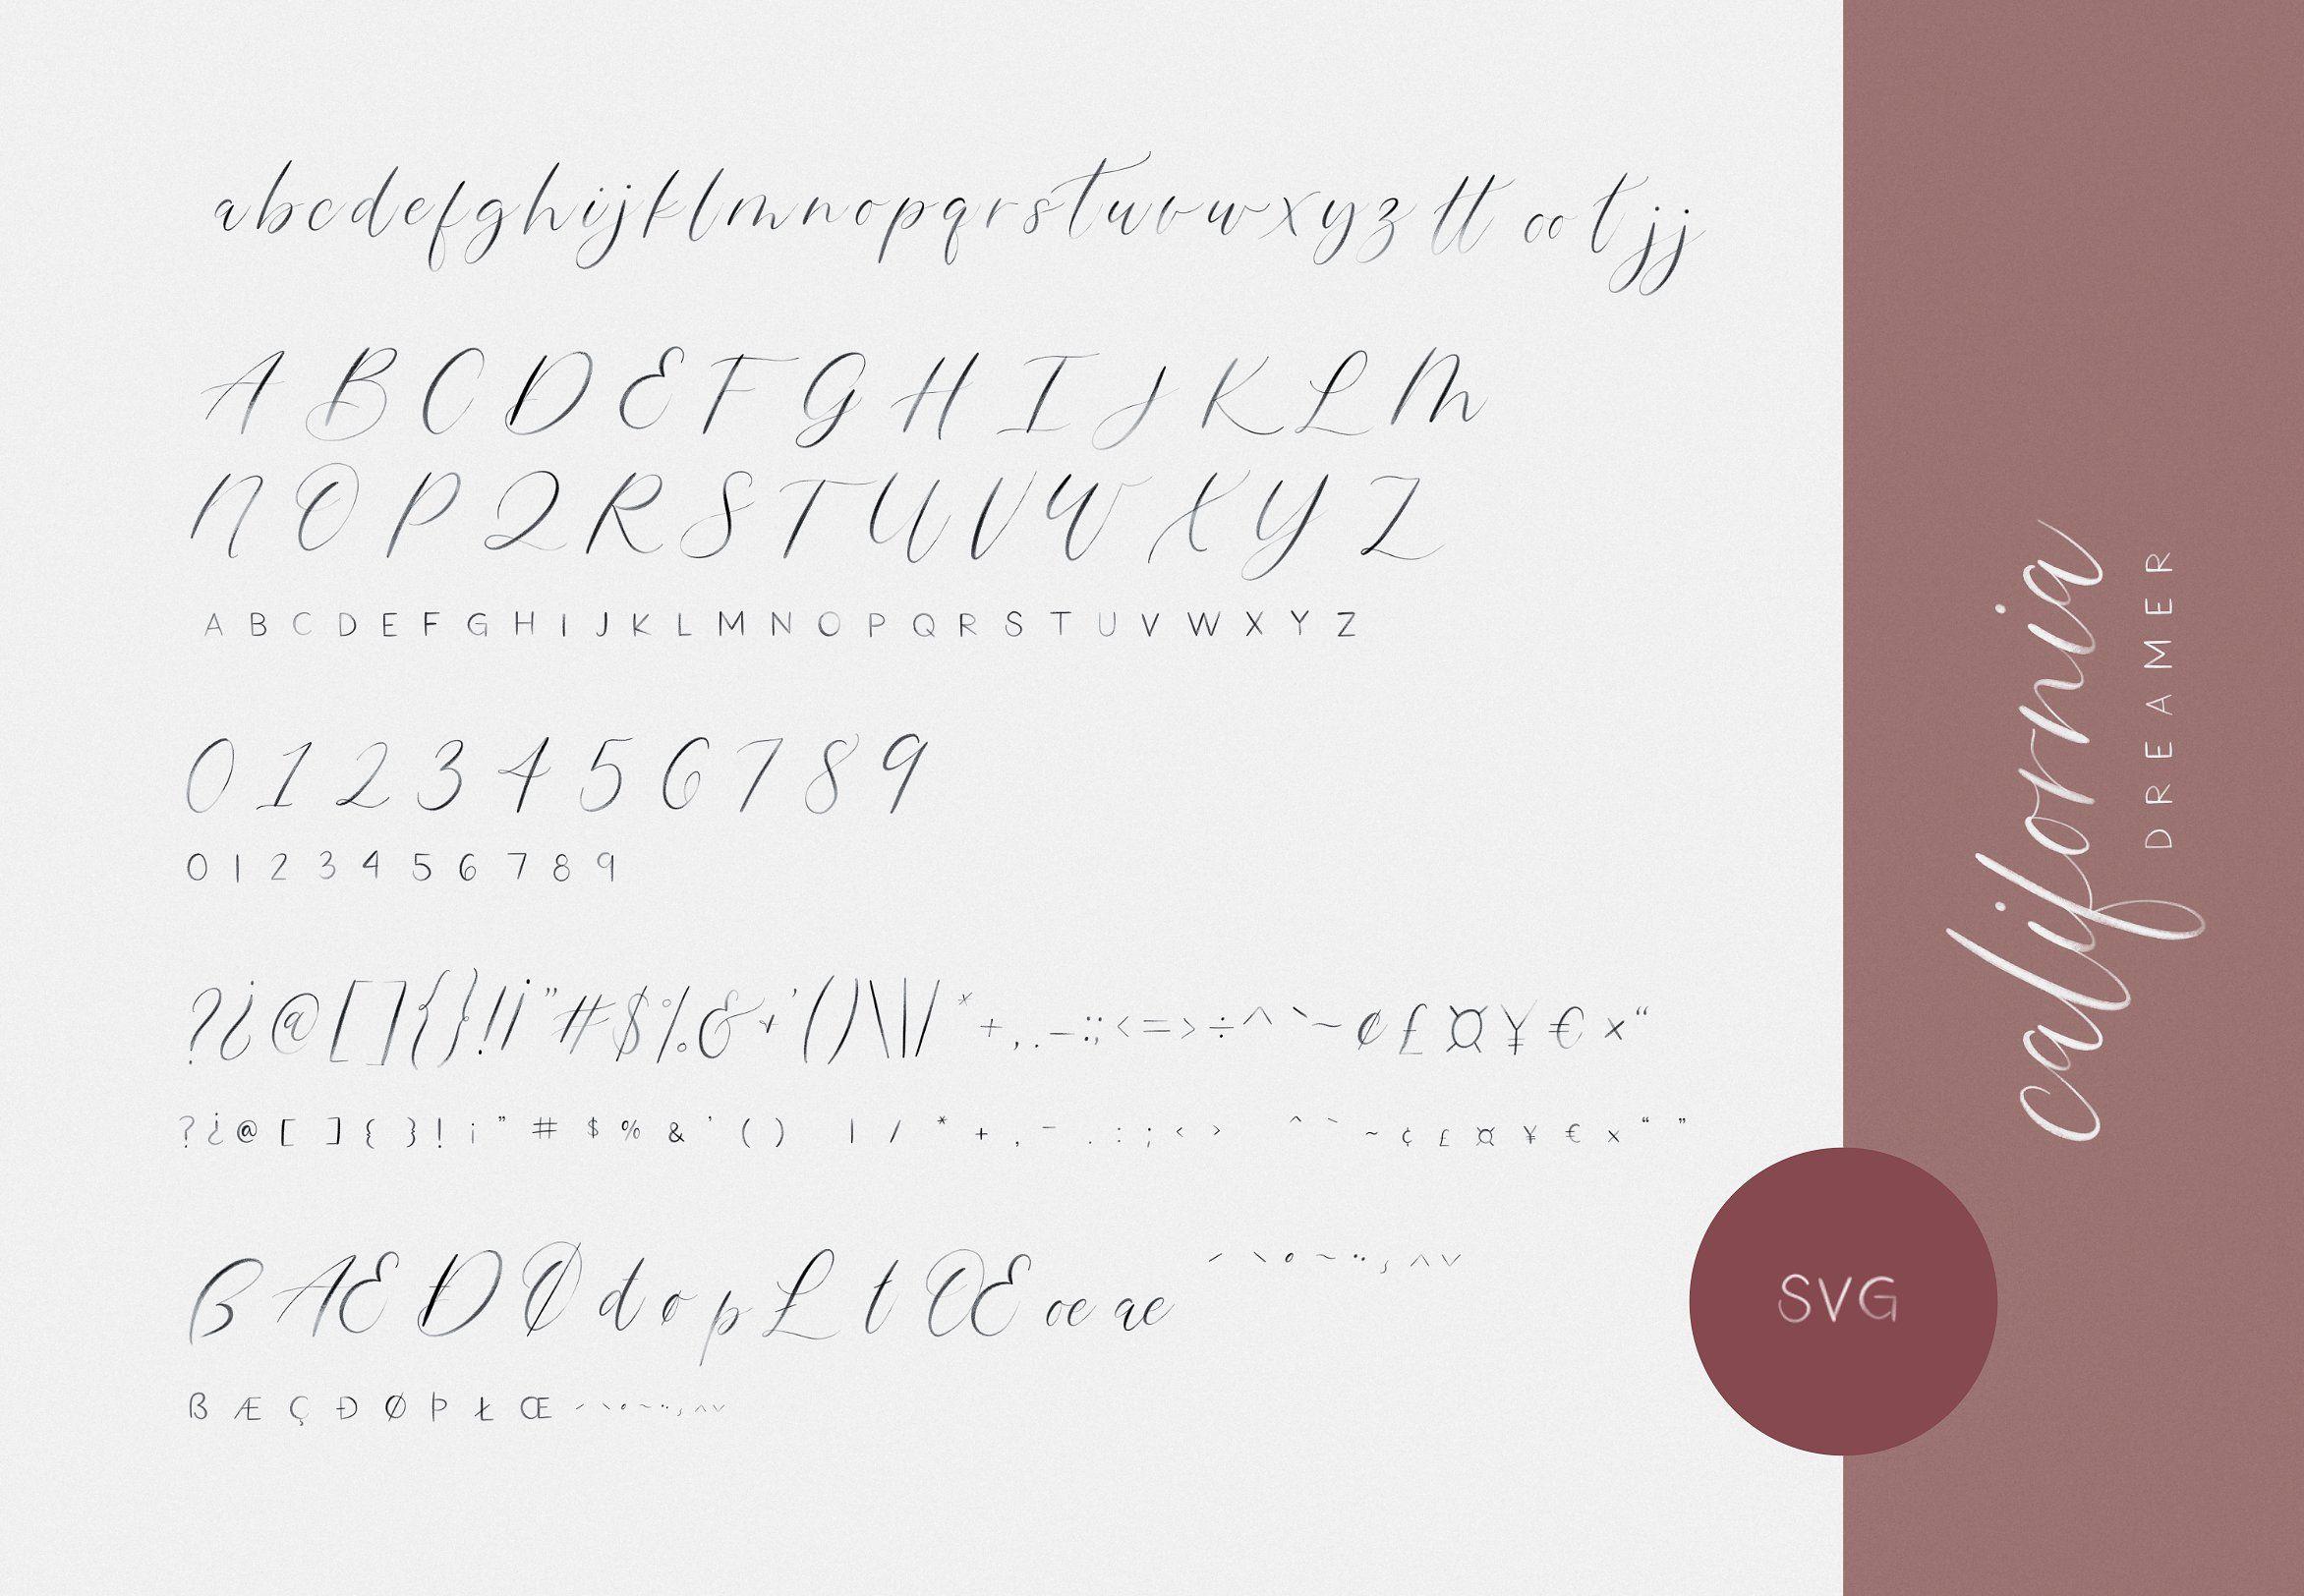 California Dreamer Font Duo SVG edgesmaintainrough